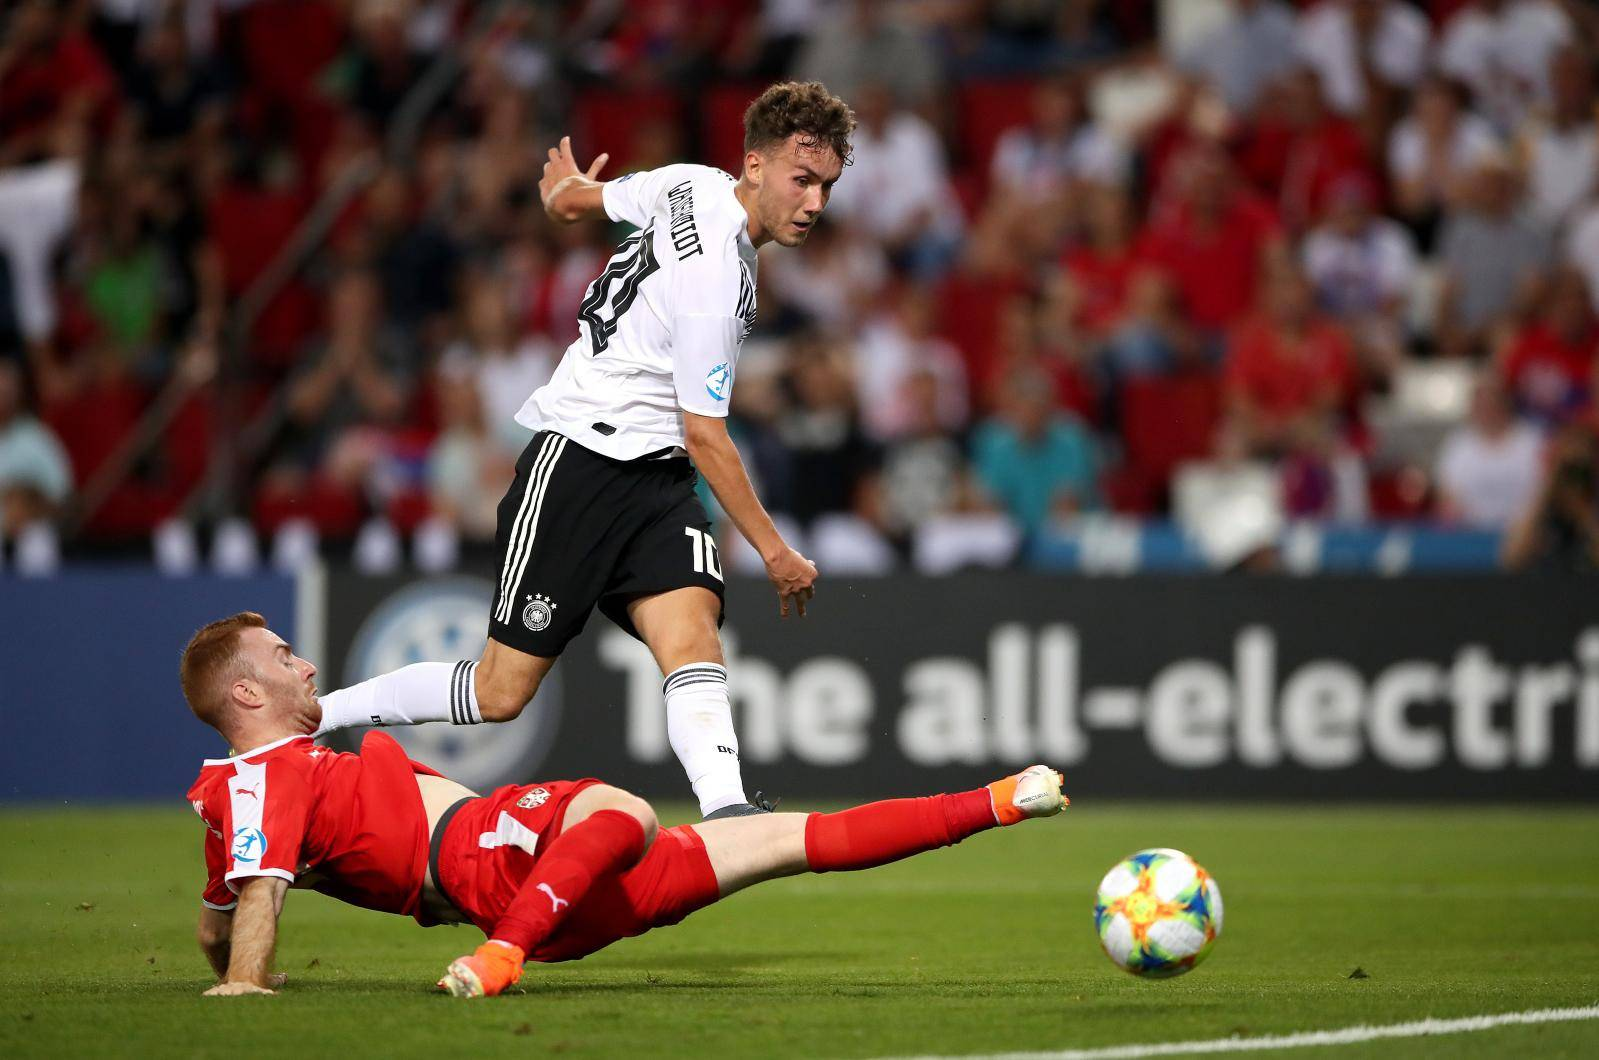 Germany U21 v Serbia U21 - UEFA European Under-21 Championship - Group B - Nereo Rocco